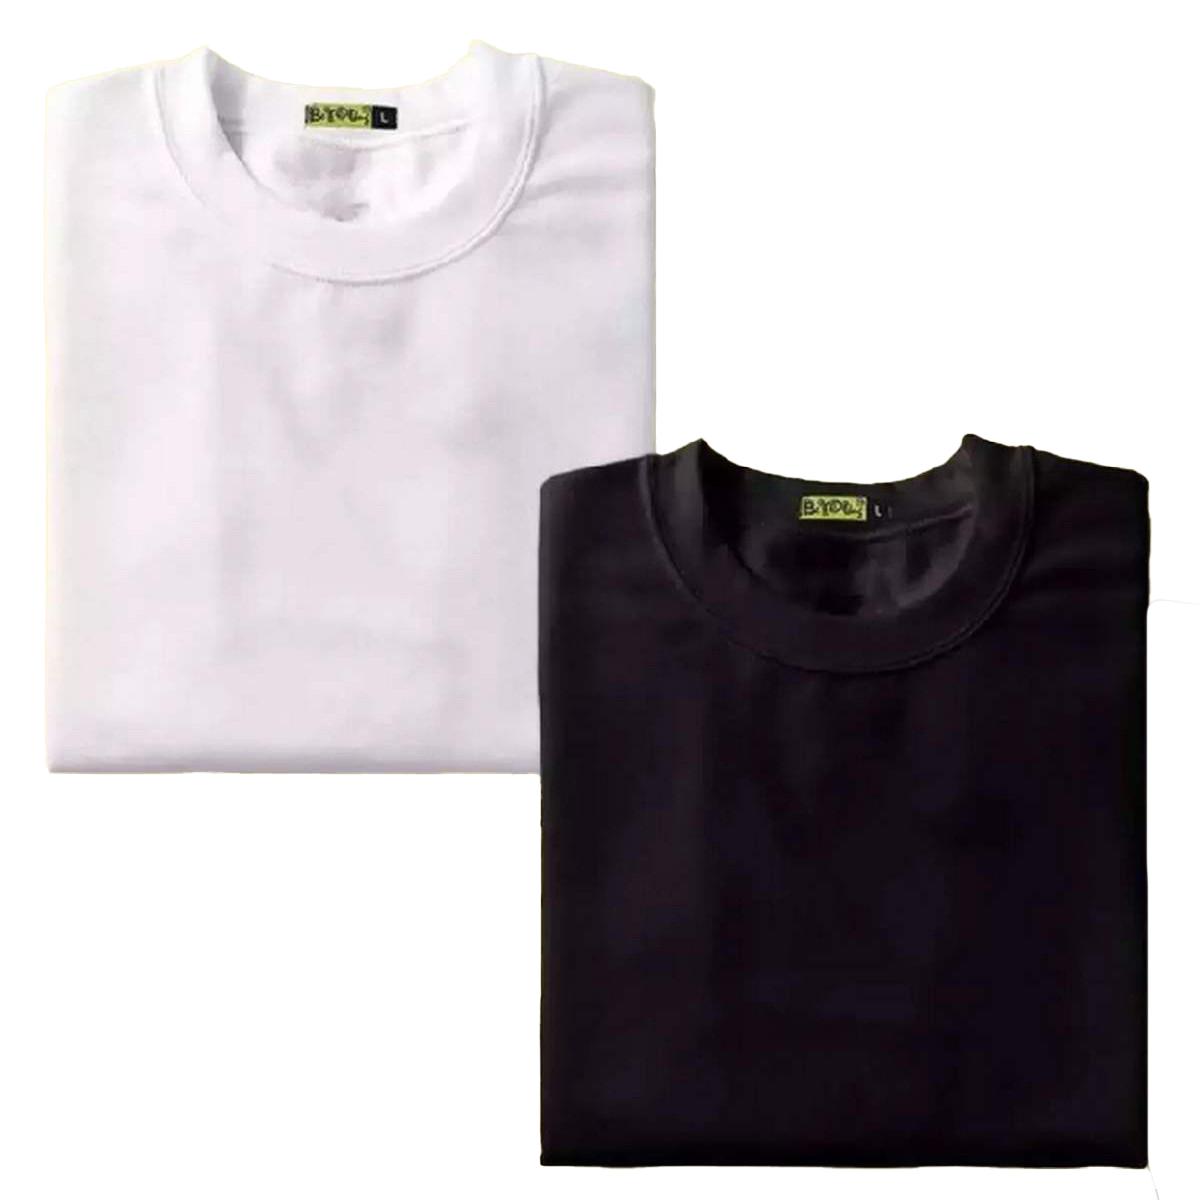 Pack of 2 plain balck and white T-shirt